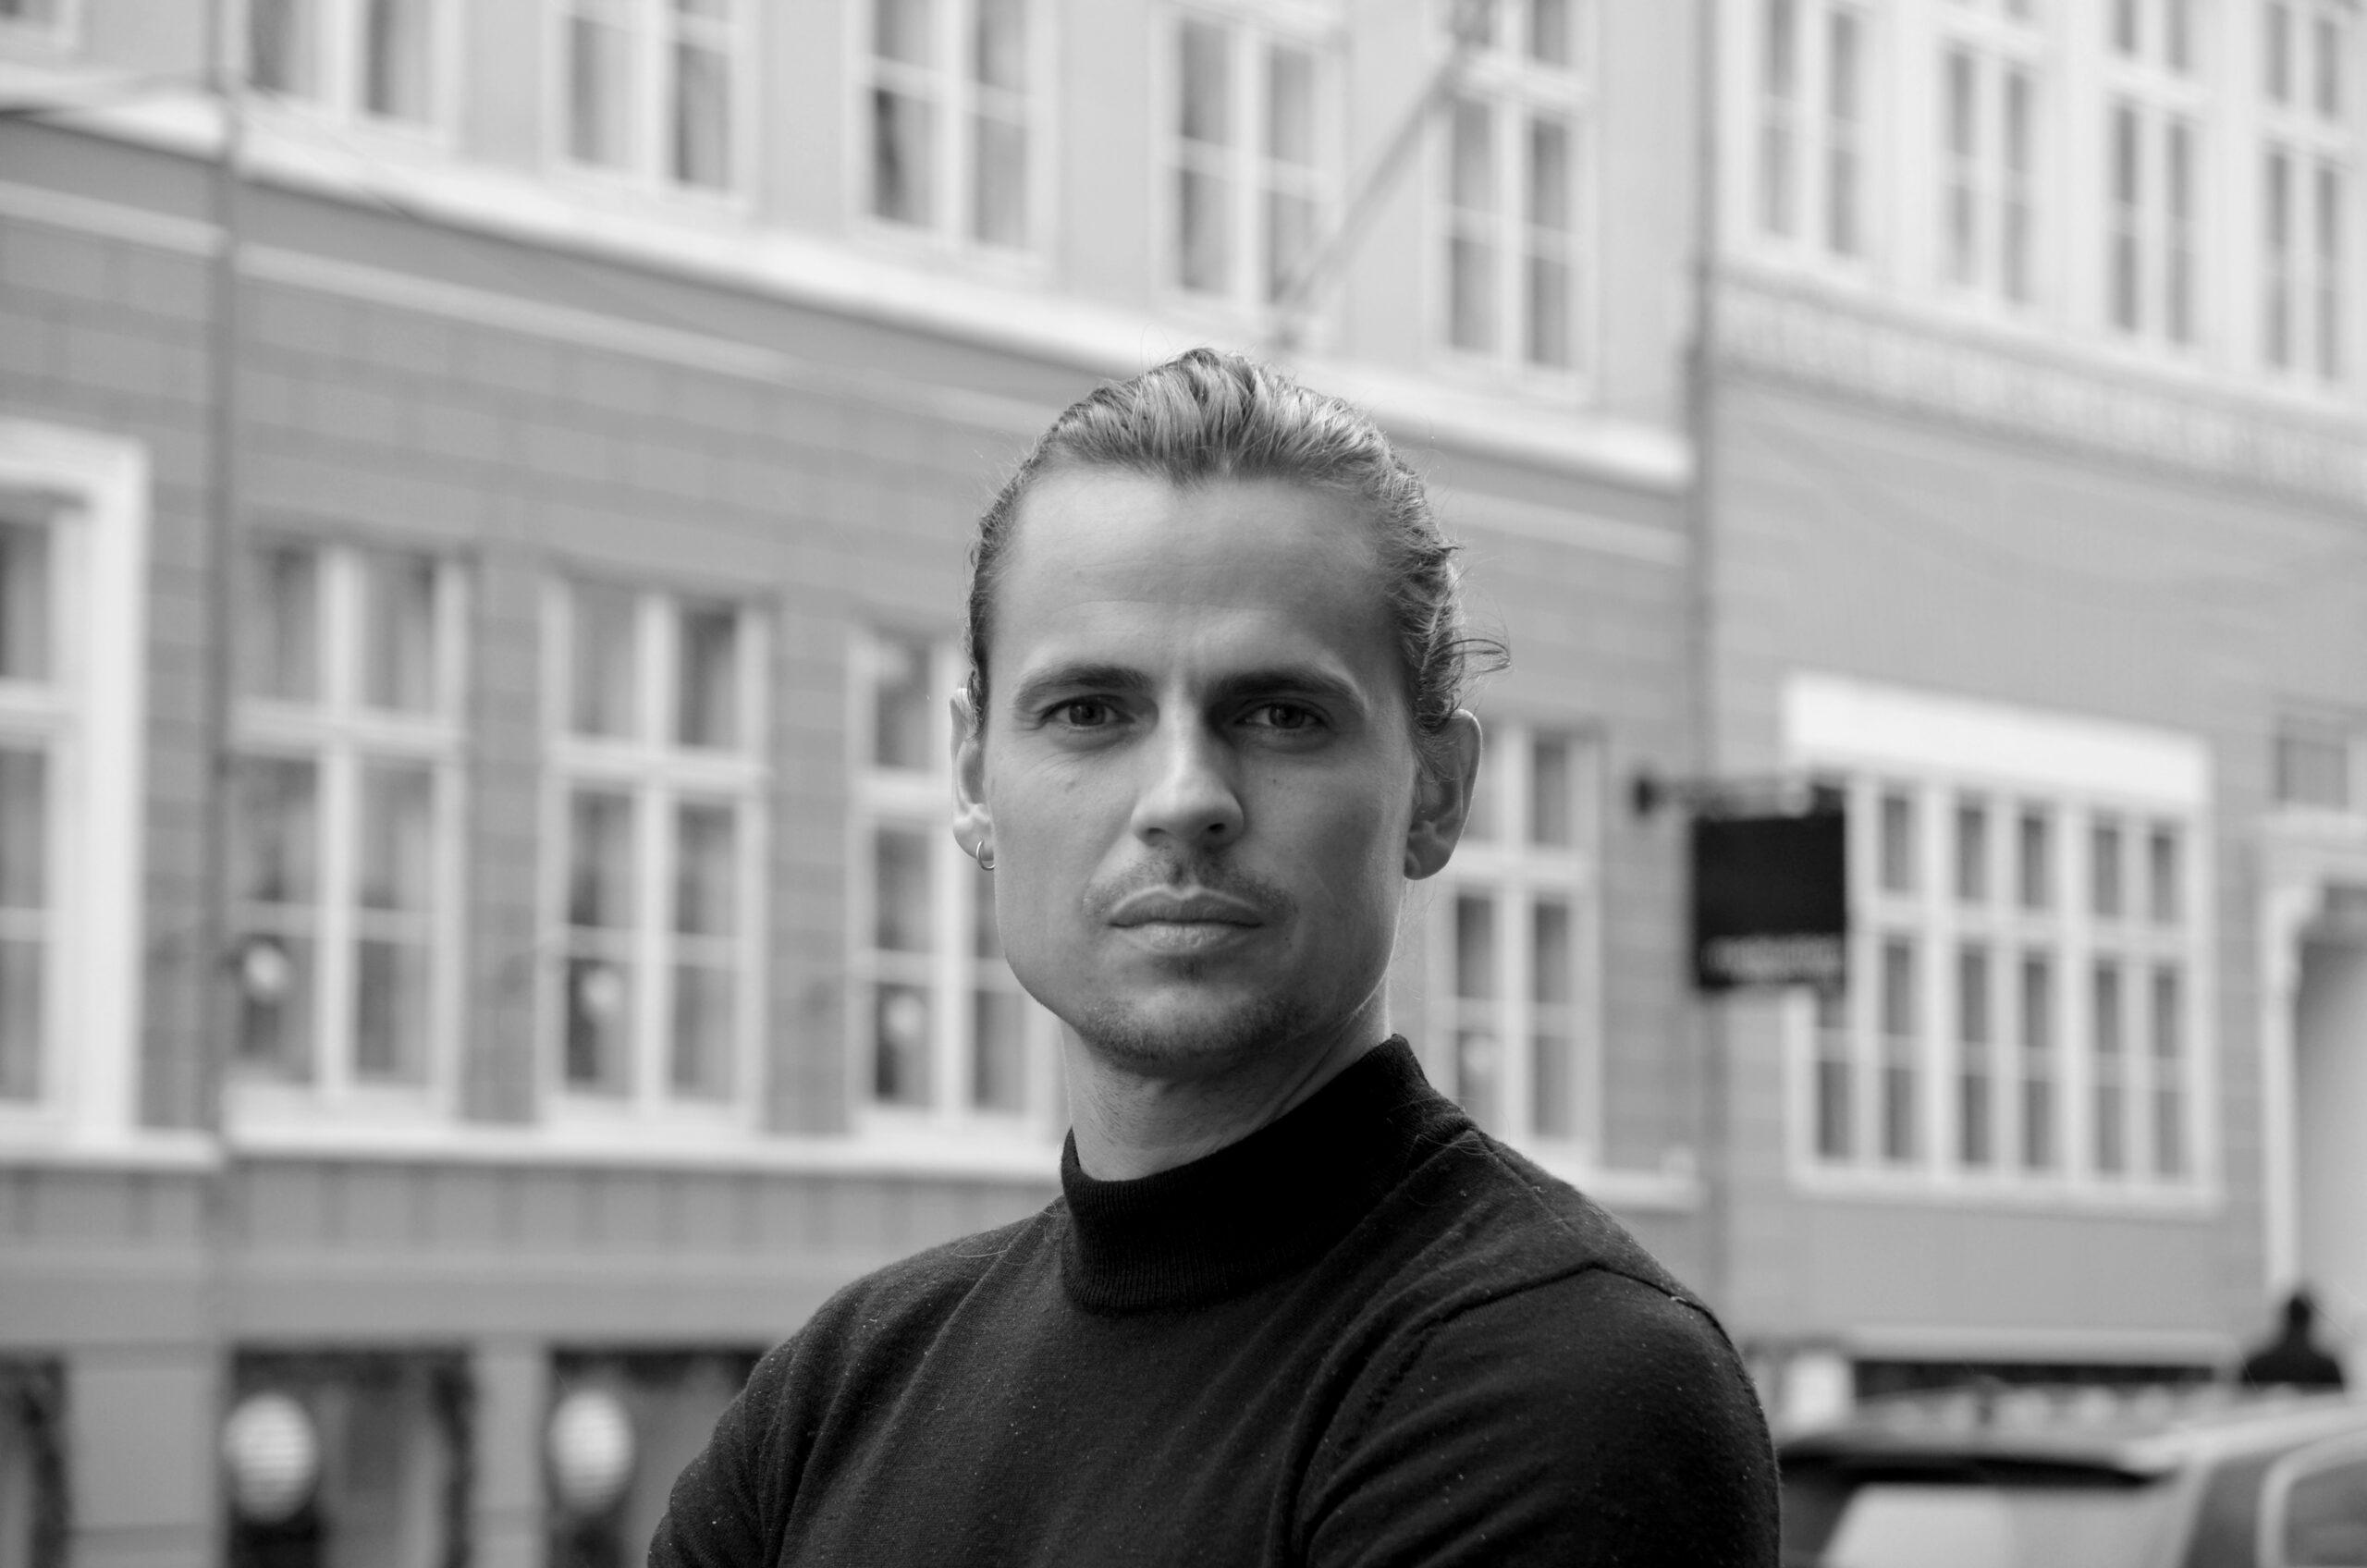 Nicolai Vittrup